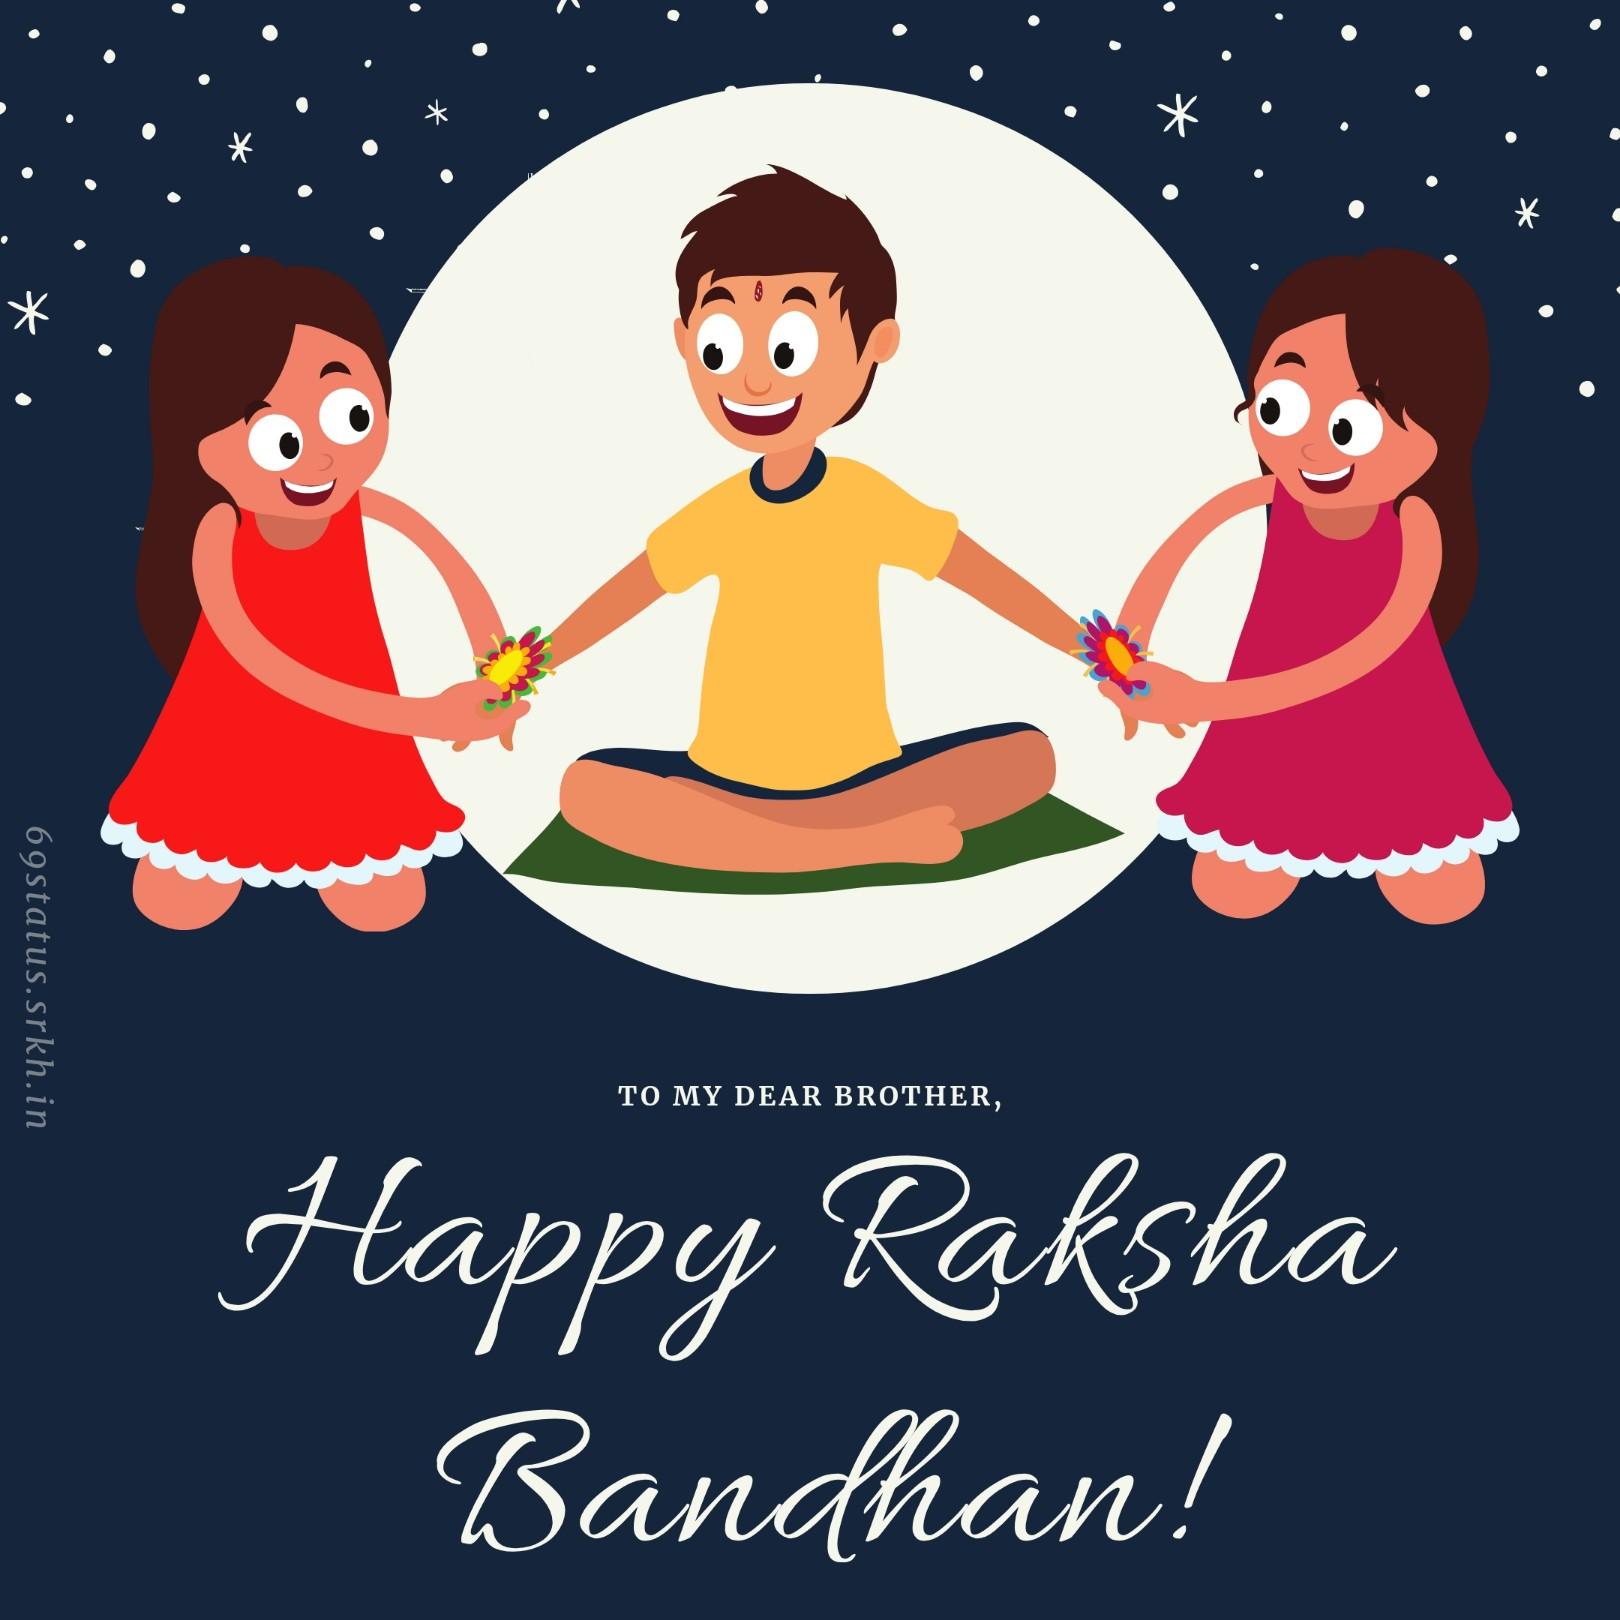 Raksha Bandhan Wishes for Brother full HD free download.